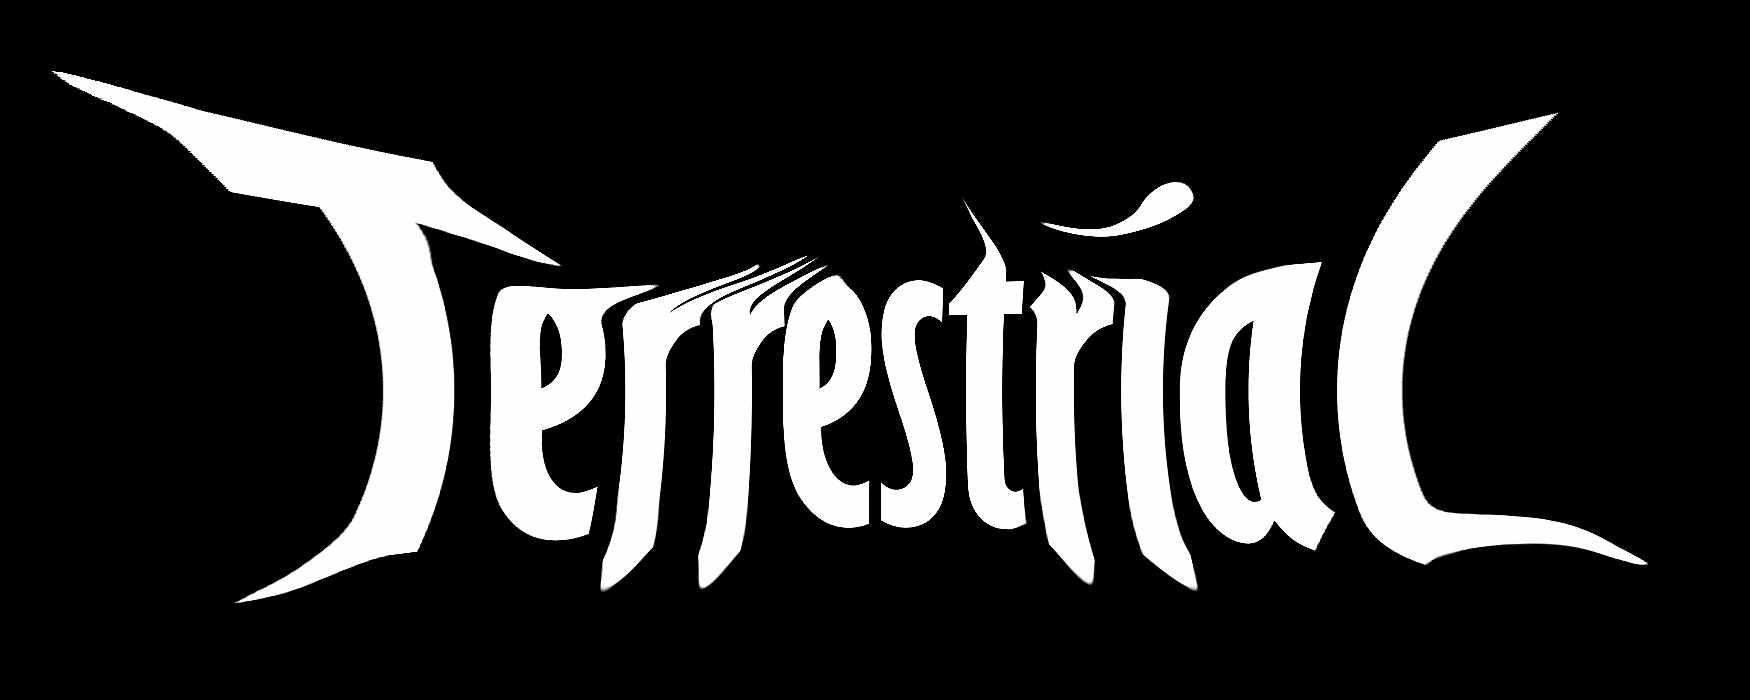 Terrestrial - Logo